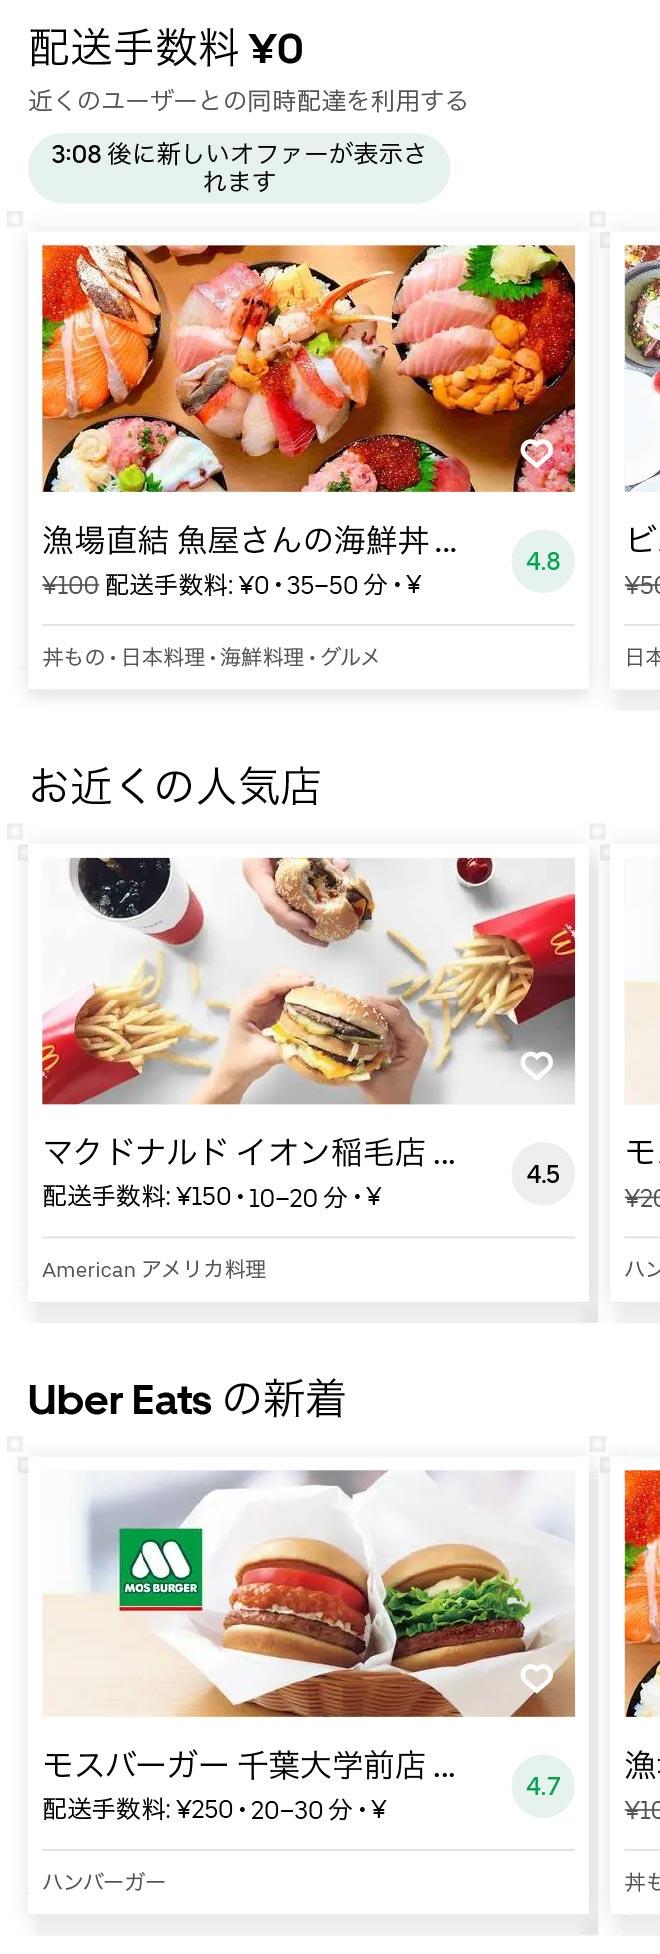 Inage menu 2010 01